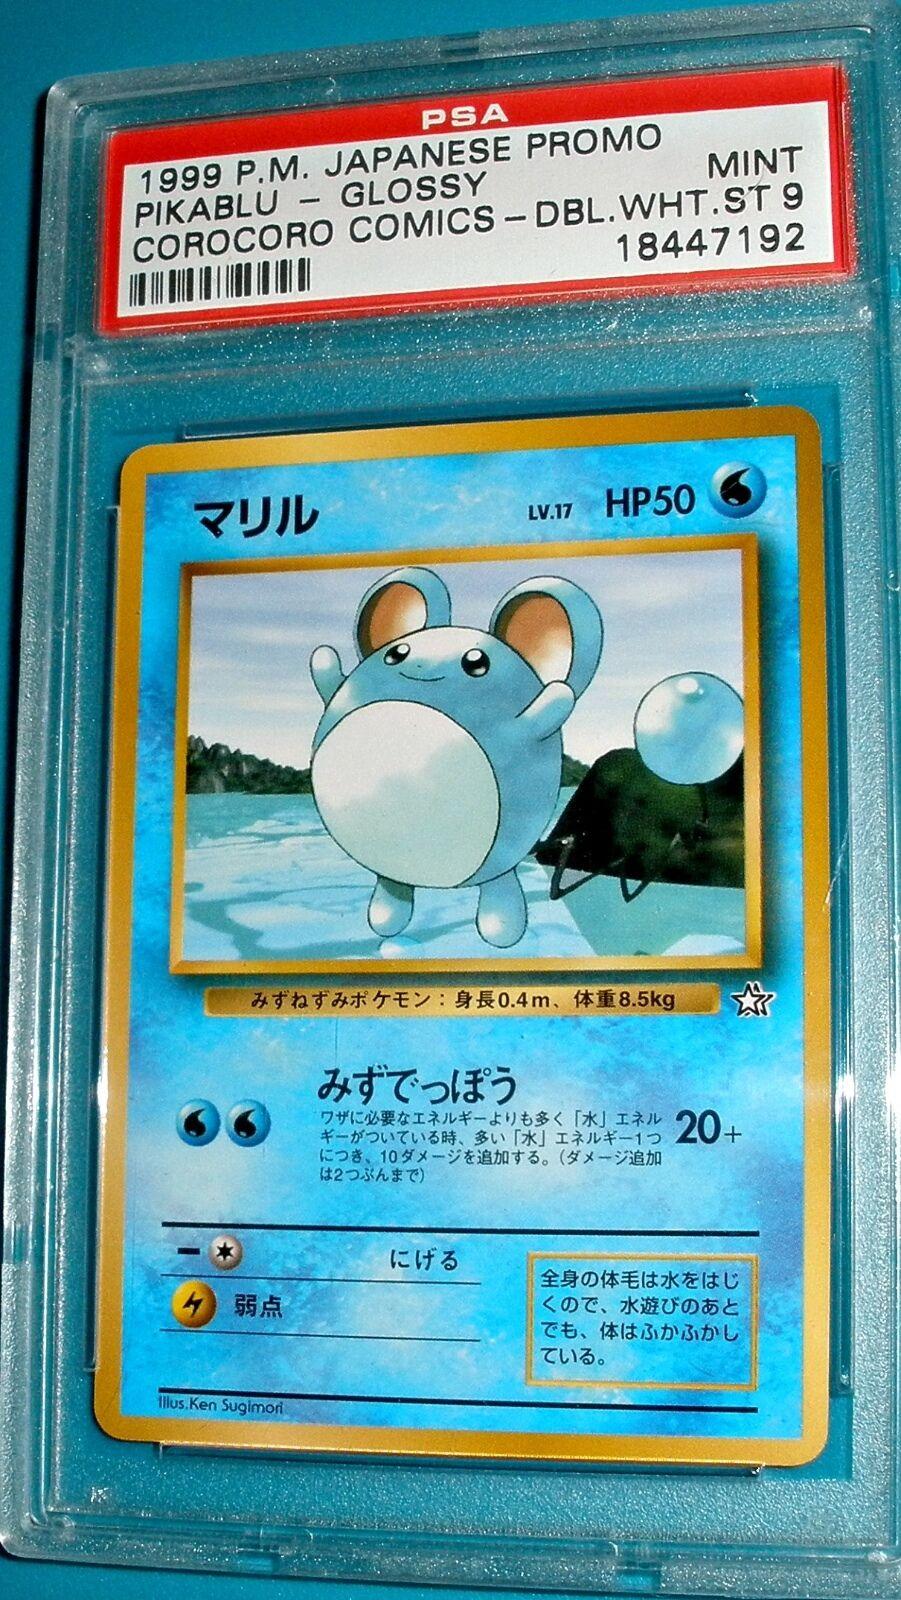 Pokemon Pikablue Marill 1997 Japanese Cgold Cgold Cgold Cgold Promo  Psa 9 1452f9